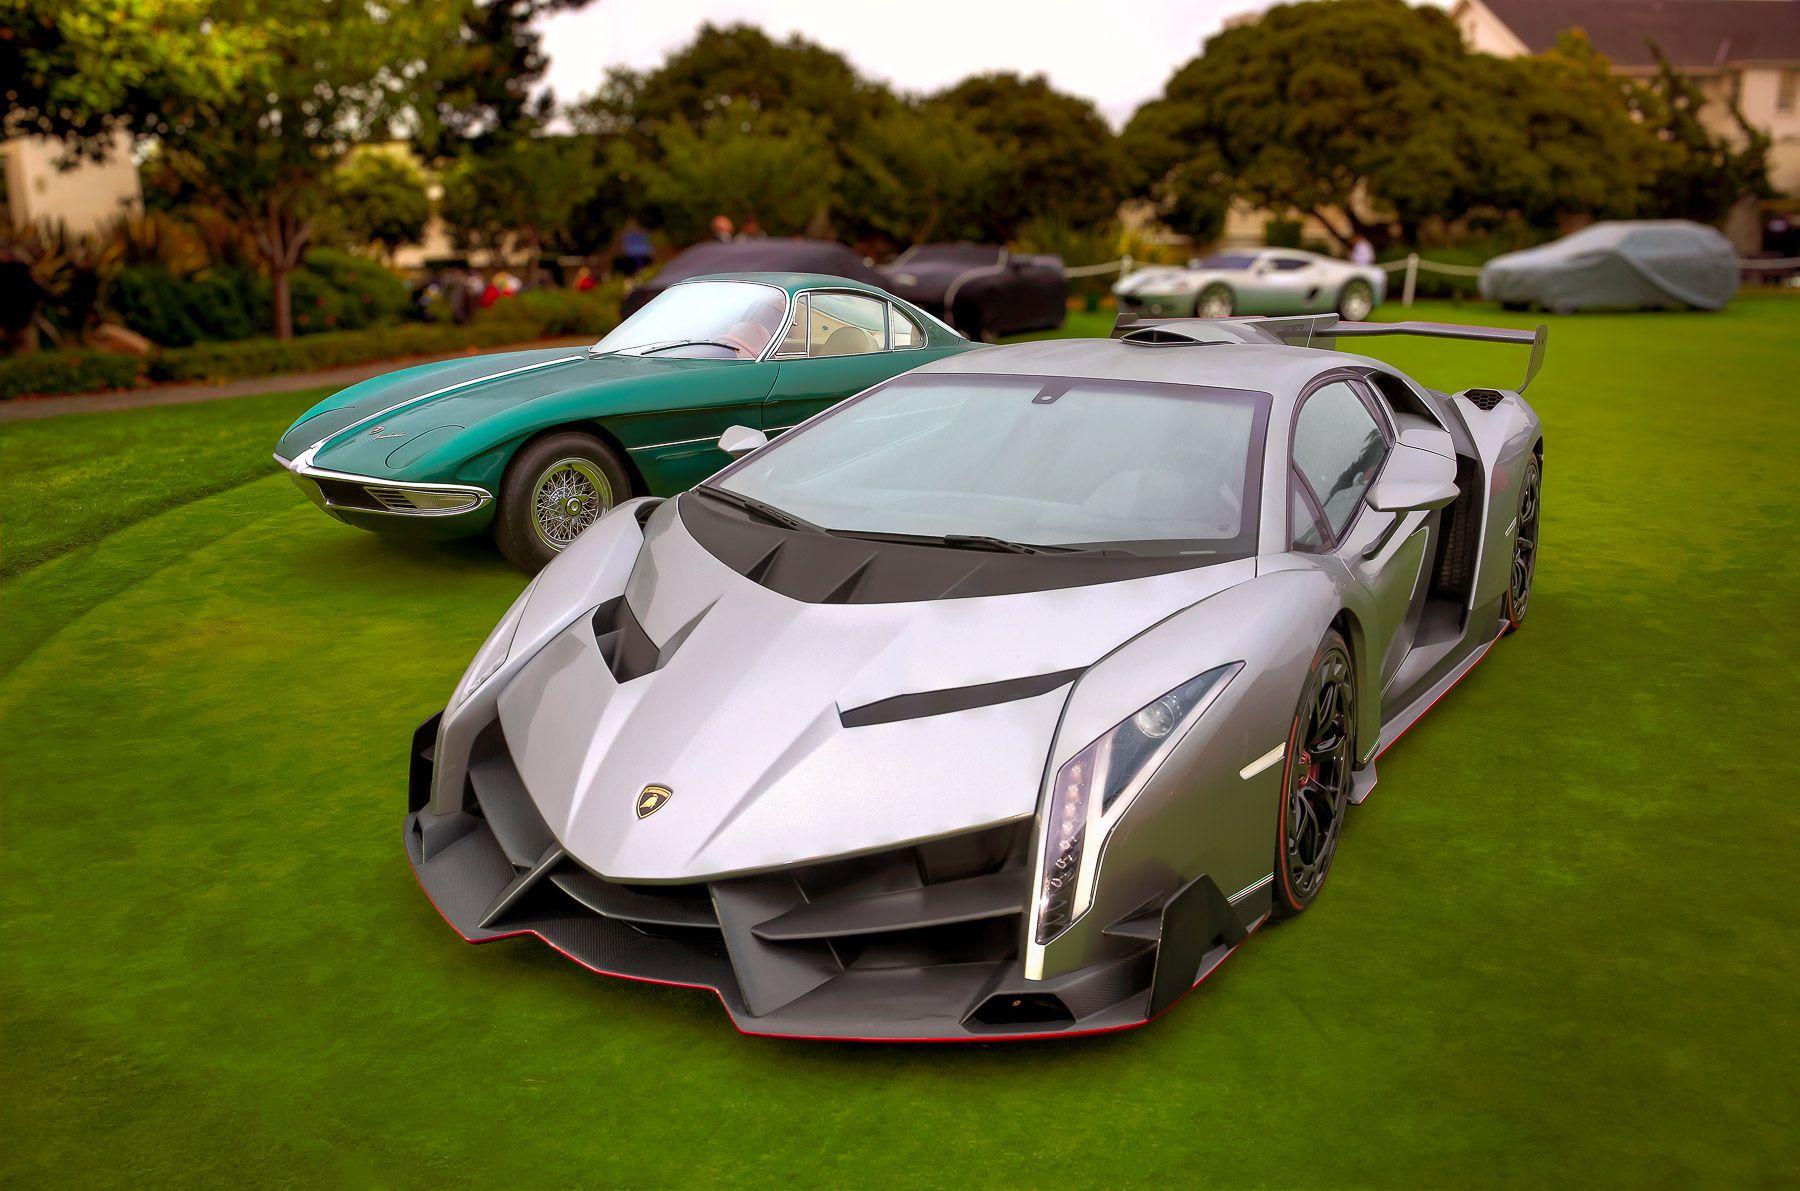 Lamborghini Veneno & 350 GTV, Monterey Car Week